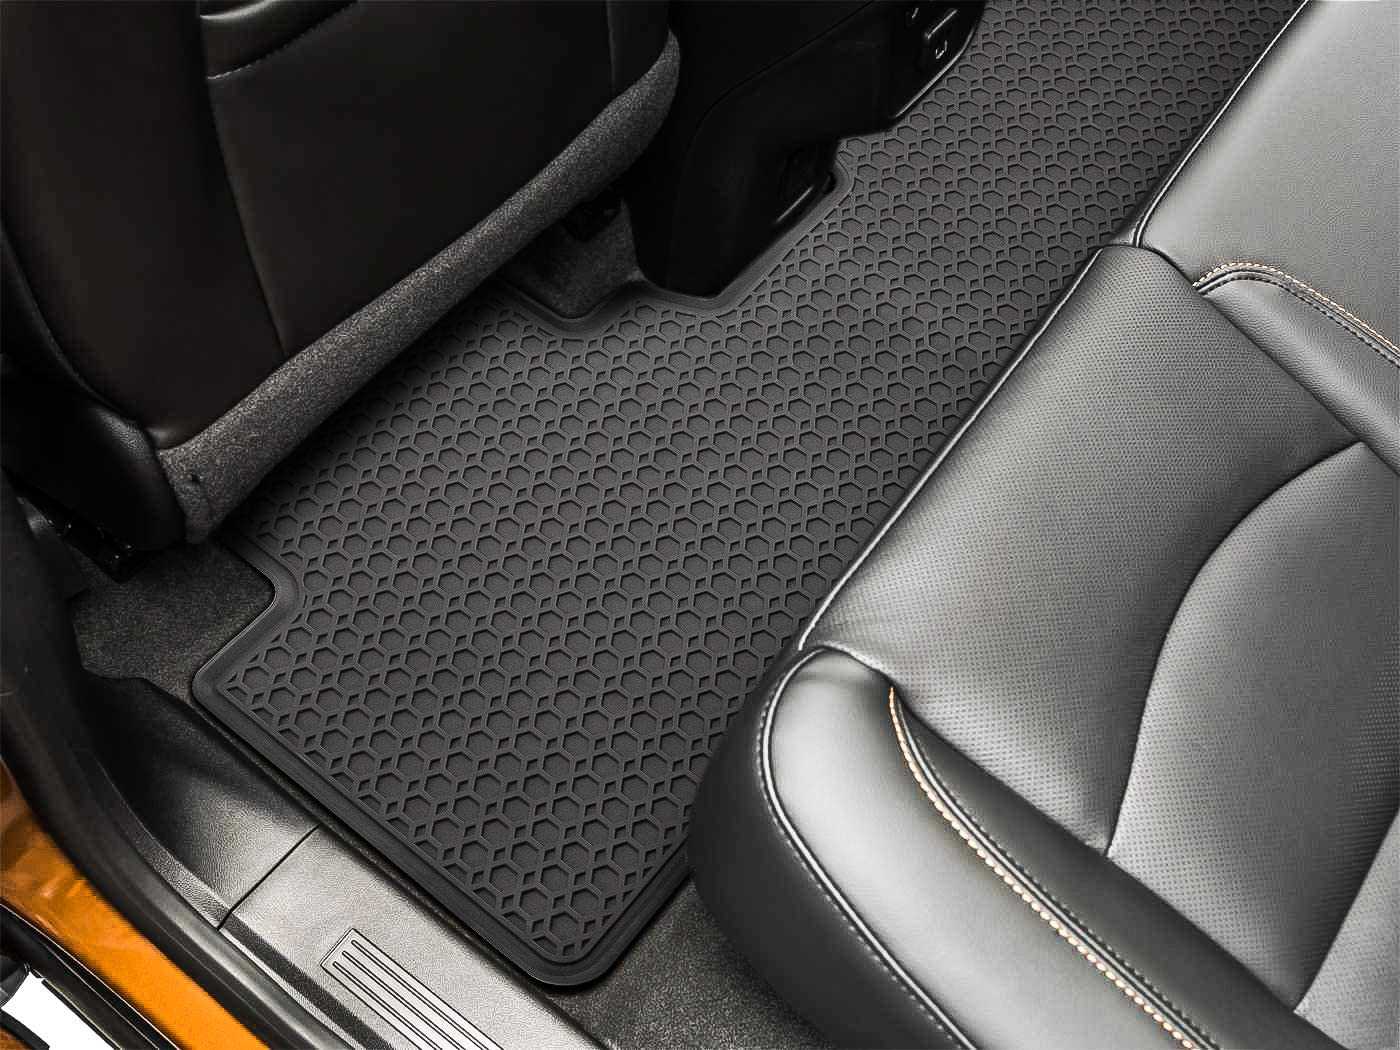 Black 3PCS E-cowlboy Floor Mat for Chevrolet Equinox 2018-2020 Heavy Duty Rubber Front+Rear Car Liner Carpet All Weather Custom Fit Waterproof Odorless